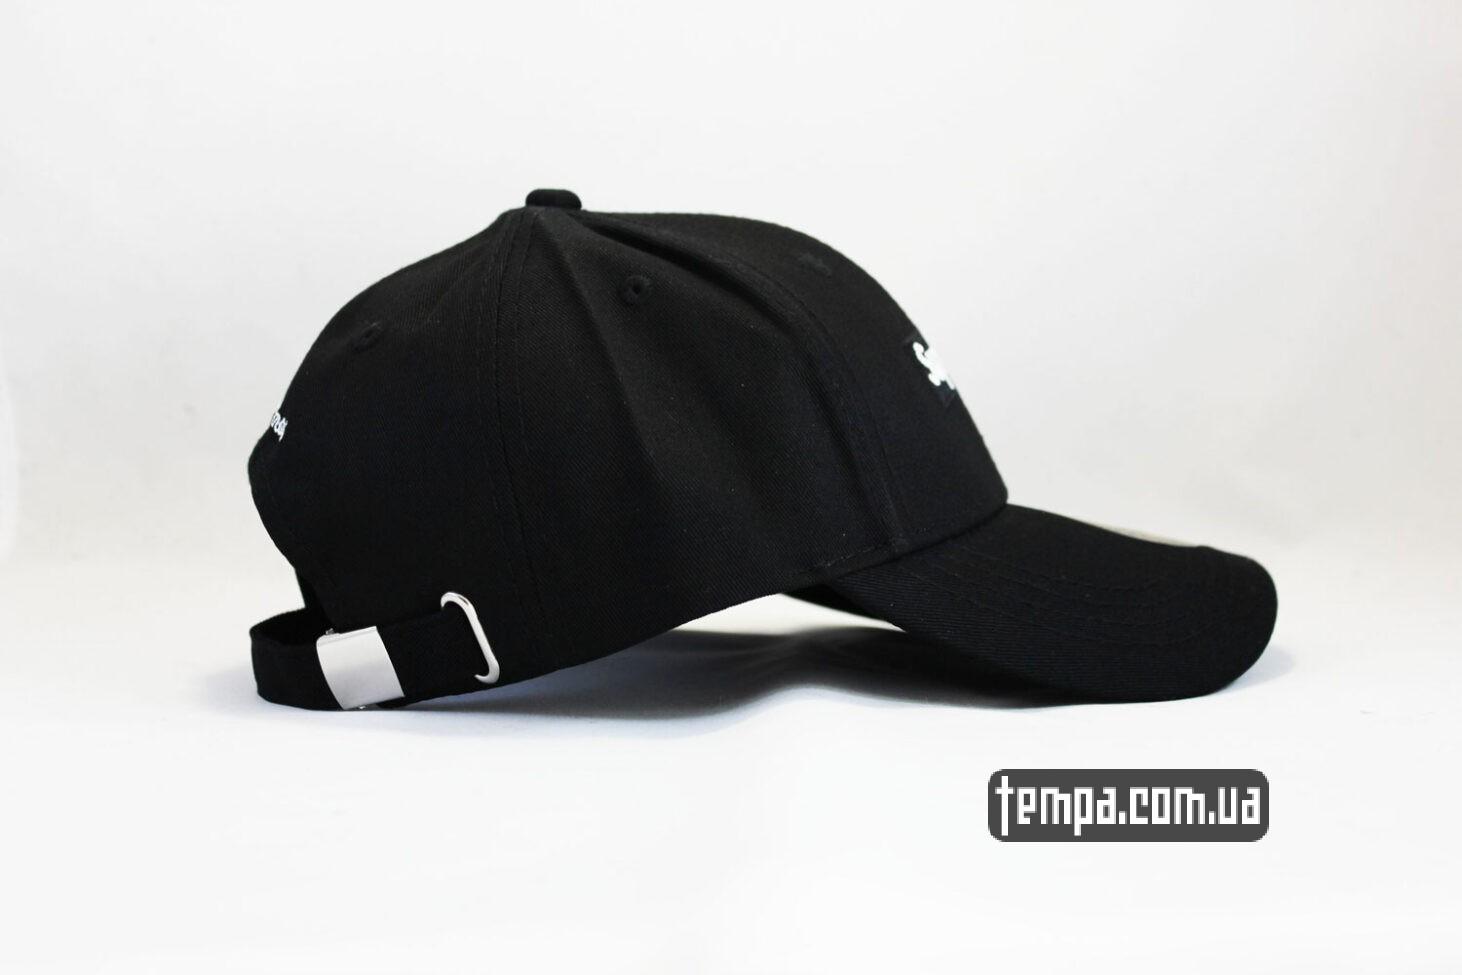 supreme black logo кепка бейсболка supreme черный логотип суприм украина